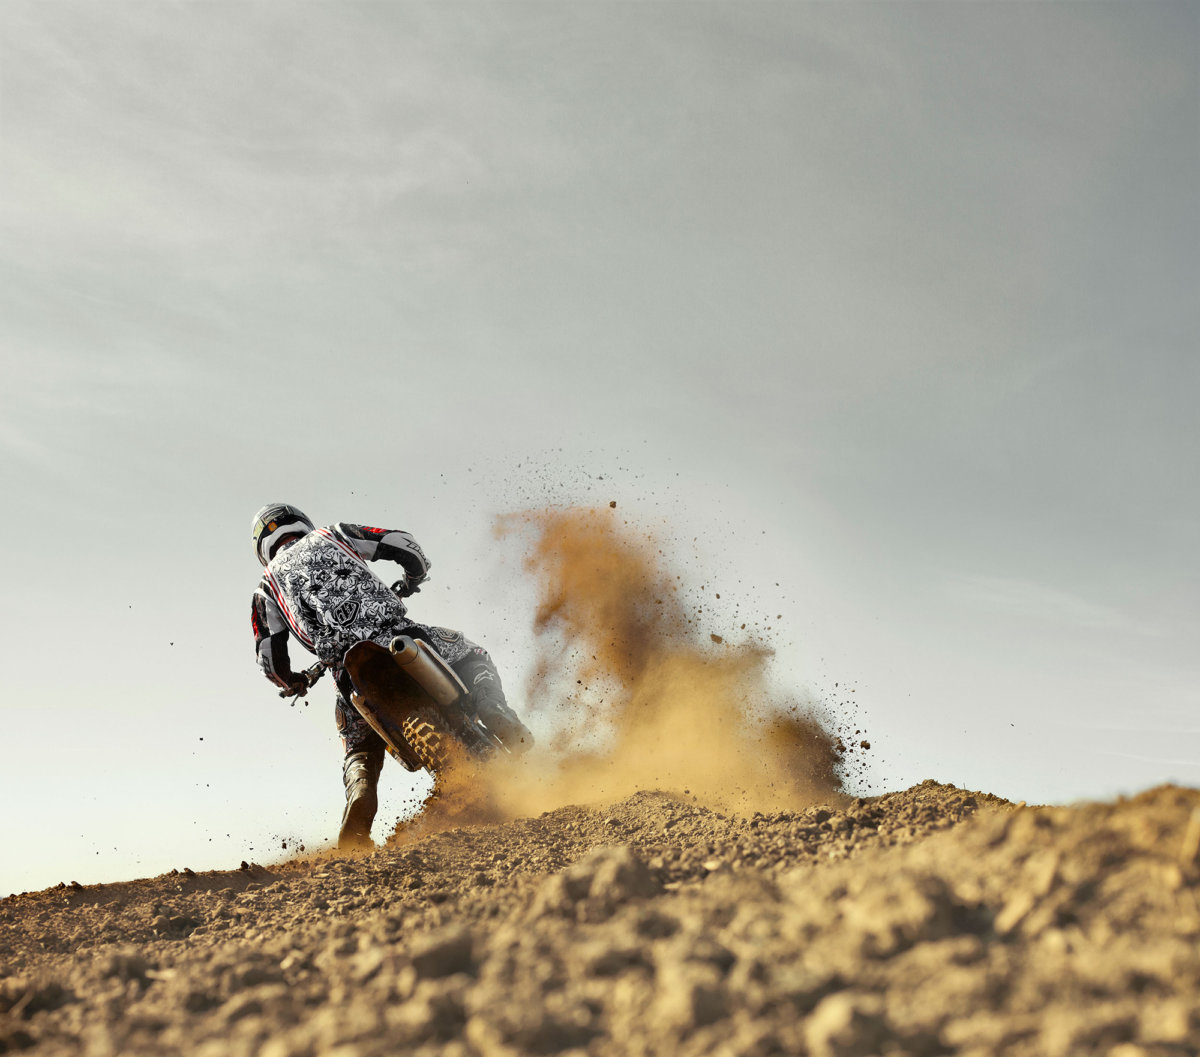 Sports -Ryan Edy - CRXSS